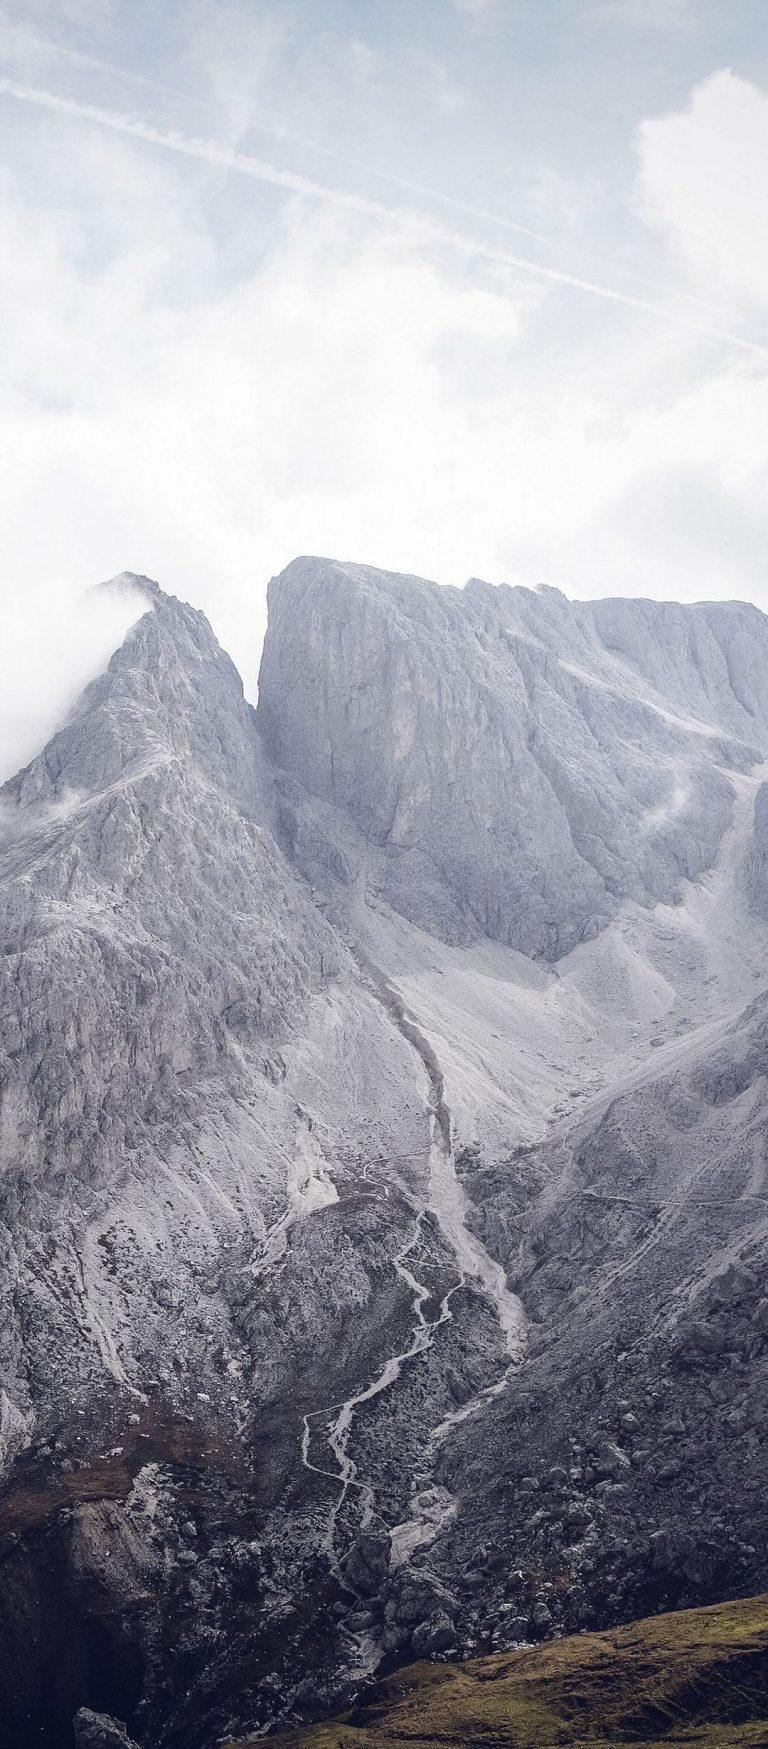 South Tyrol Bolzano Mountains Clouds 1080x2460 768x1749